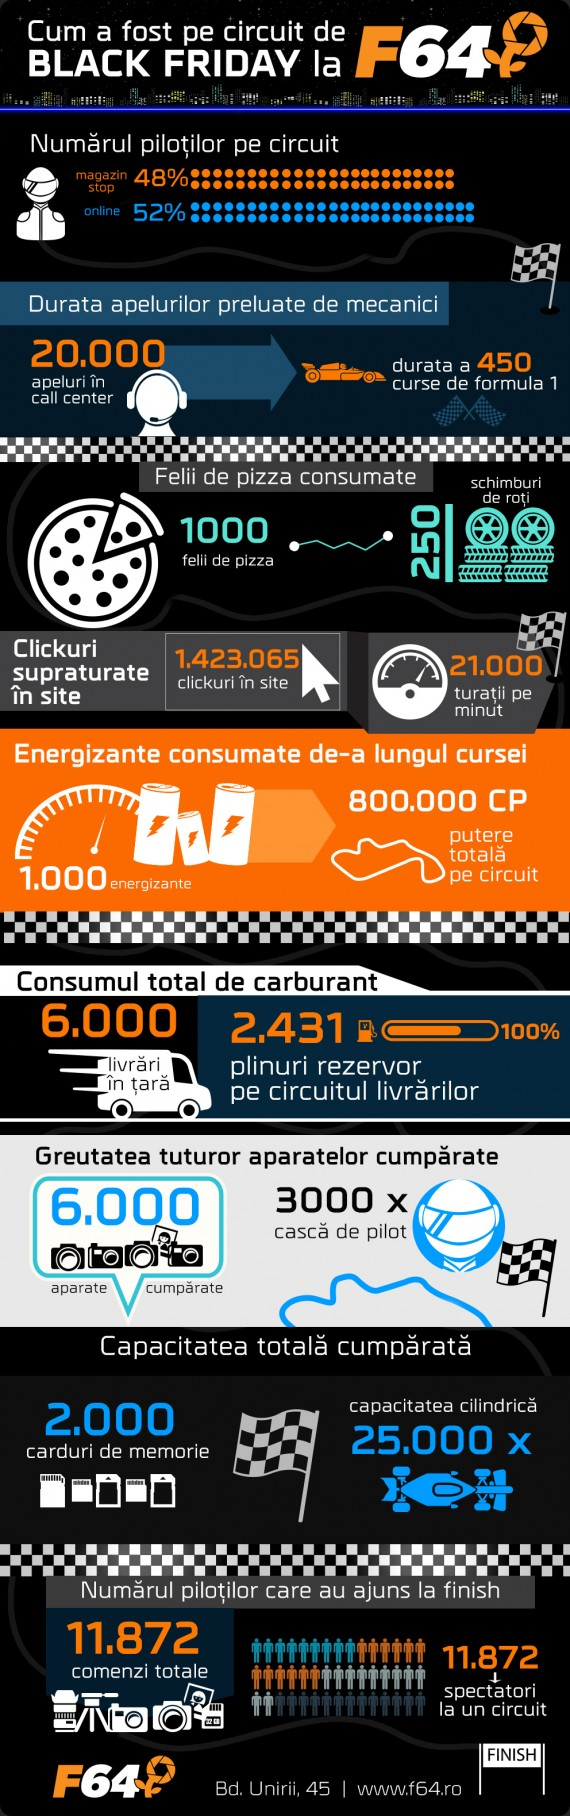 infografic_blackfriday_f64_2014